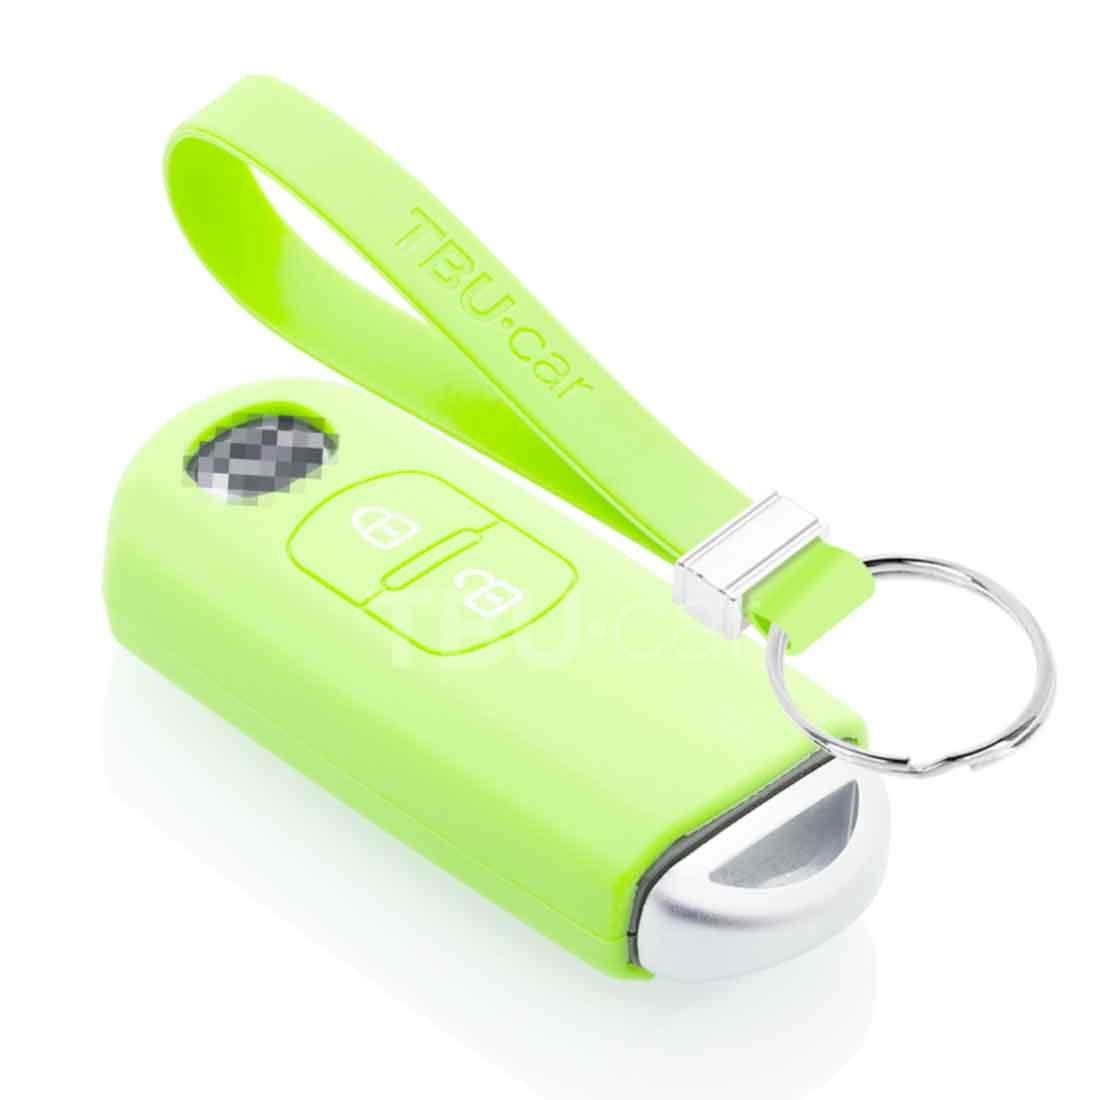 TBU car TBU car Sleutel cover compatibel met Mazda - Silicone sleutelhoesje - beschermhoesje autosleutel - Glow in the Dark